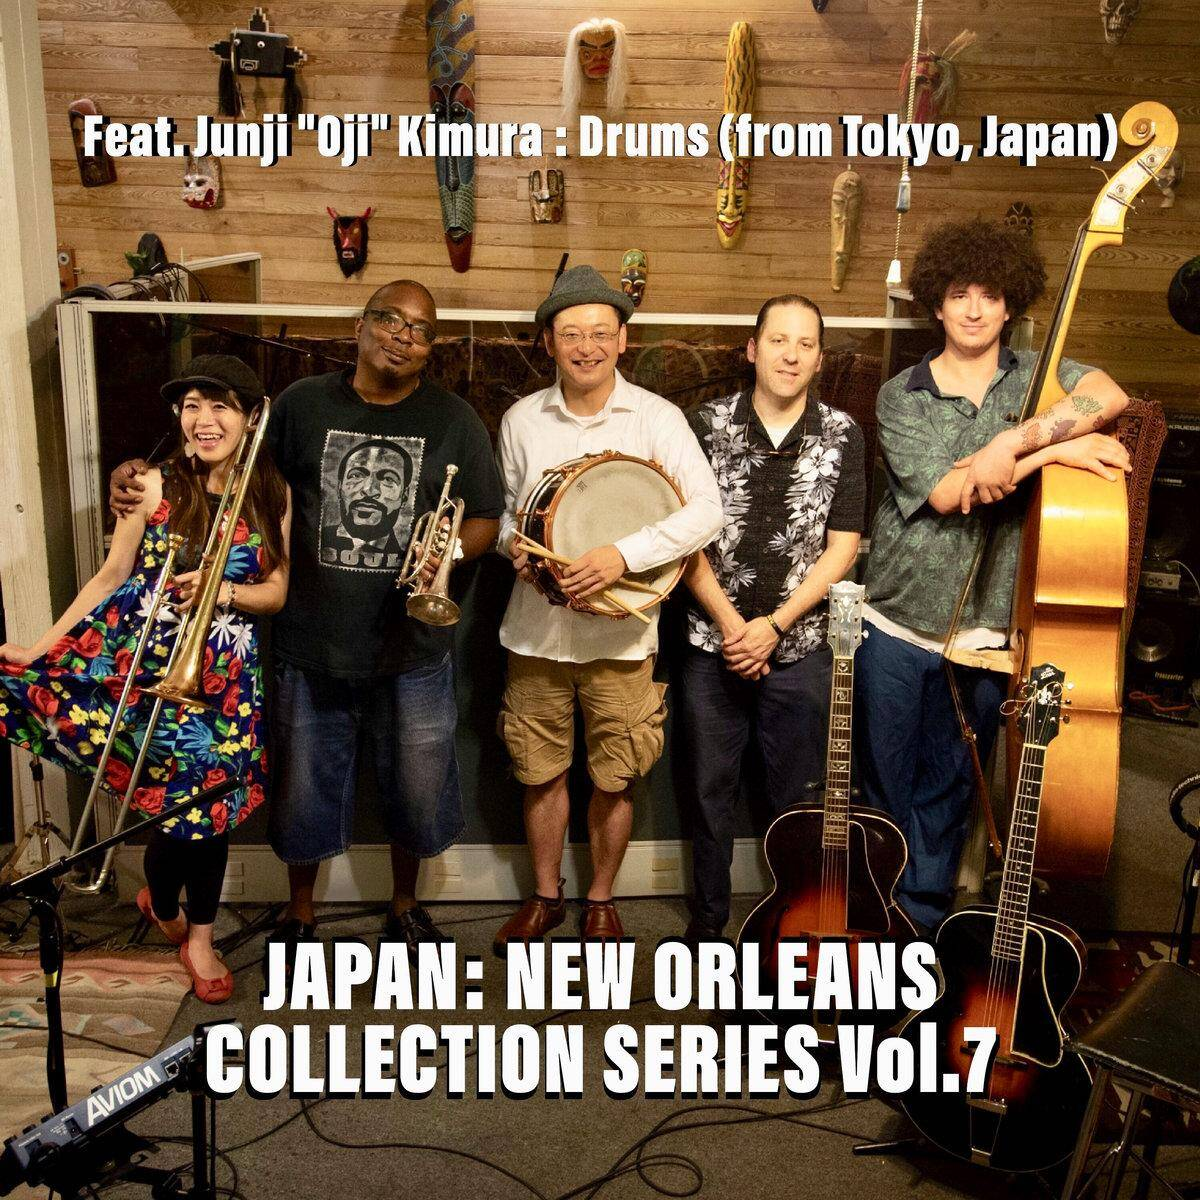 Haruka Kikuchi- Japan: New Orleans Collection Vol.7